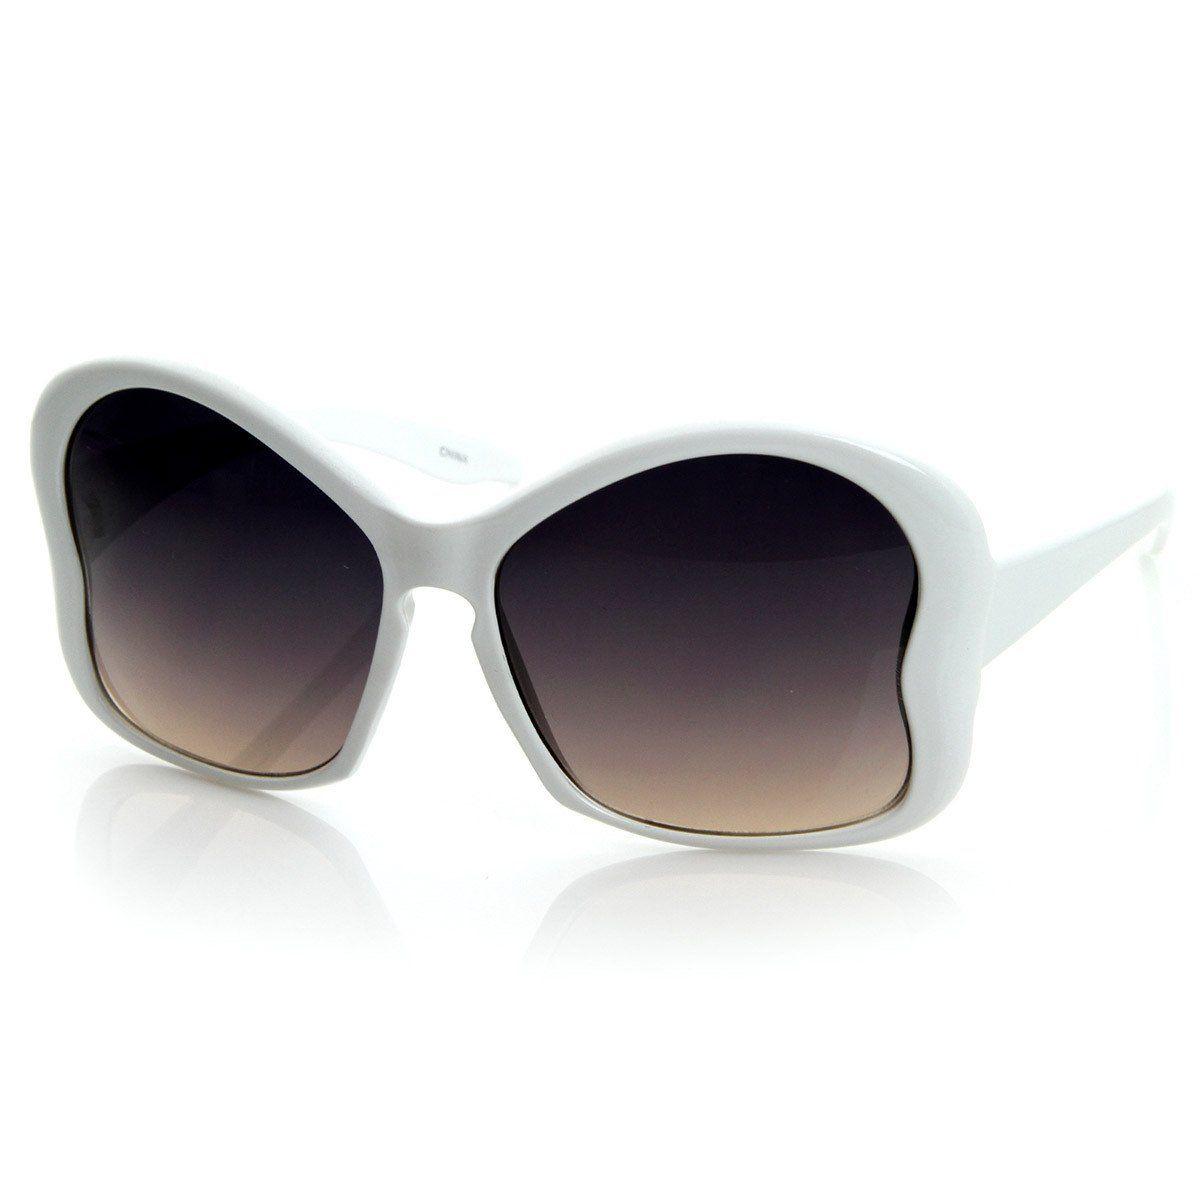 3e359030a48 Women s Fashion NYC Designer Oversize Butterfly Shape Sunglasses 8576